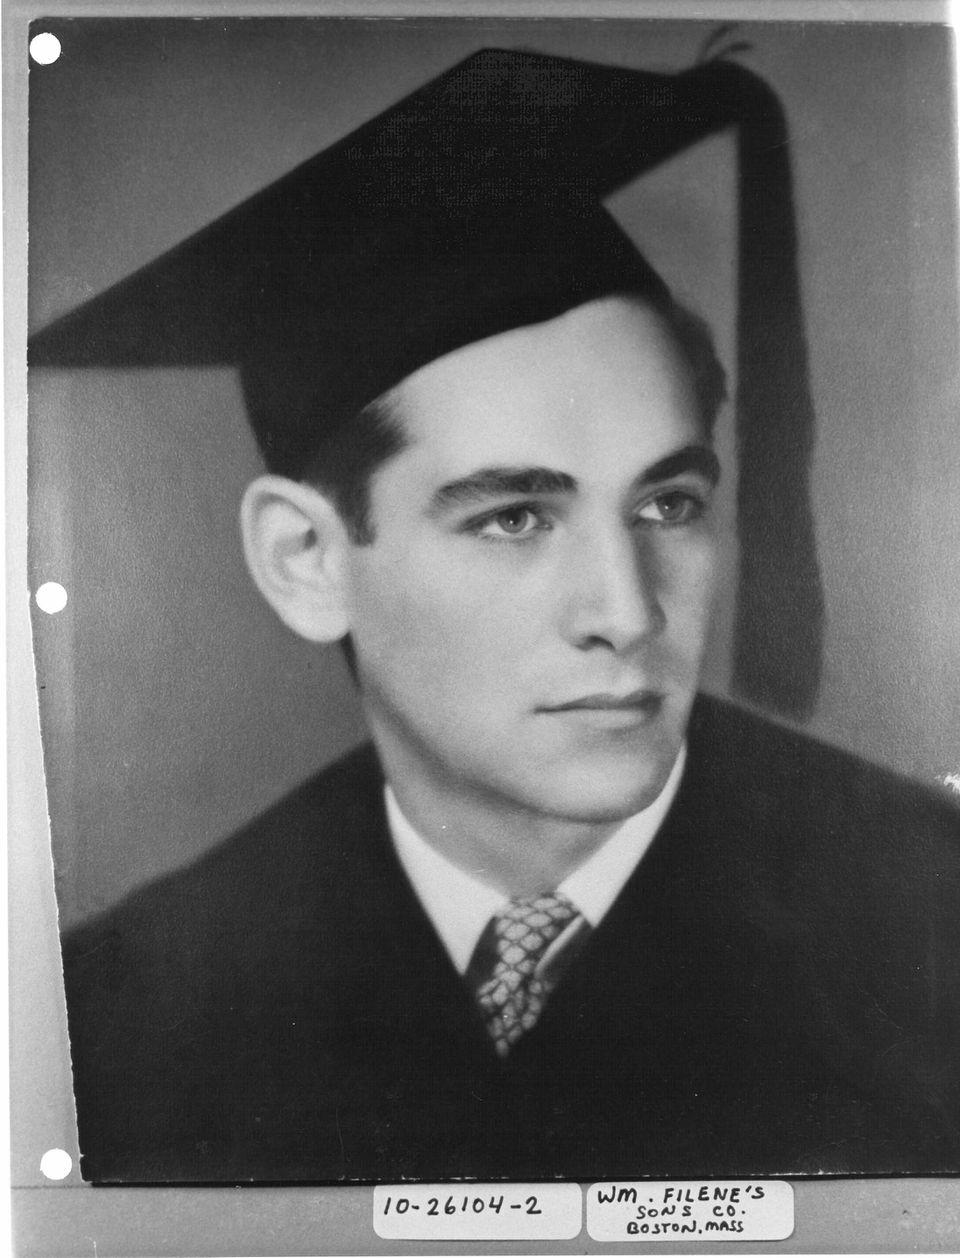 Leonard Bernstein at his Harvard graduation in 1939.